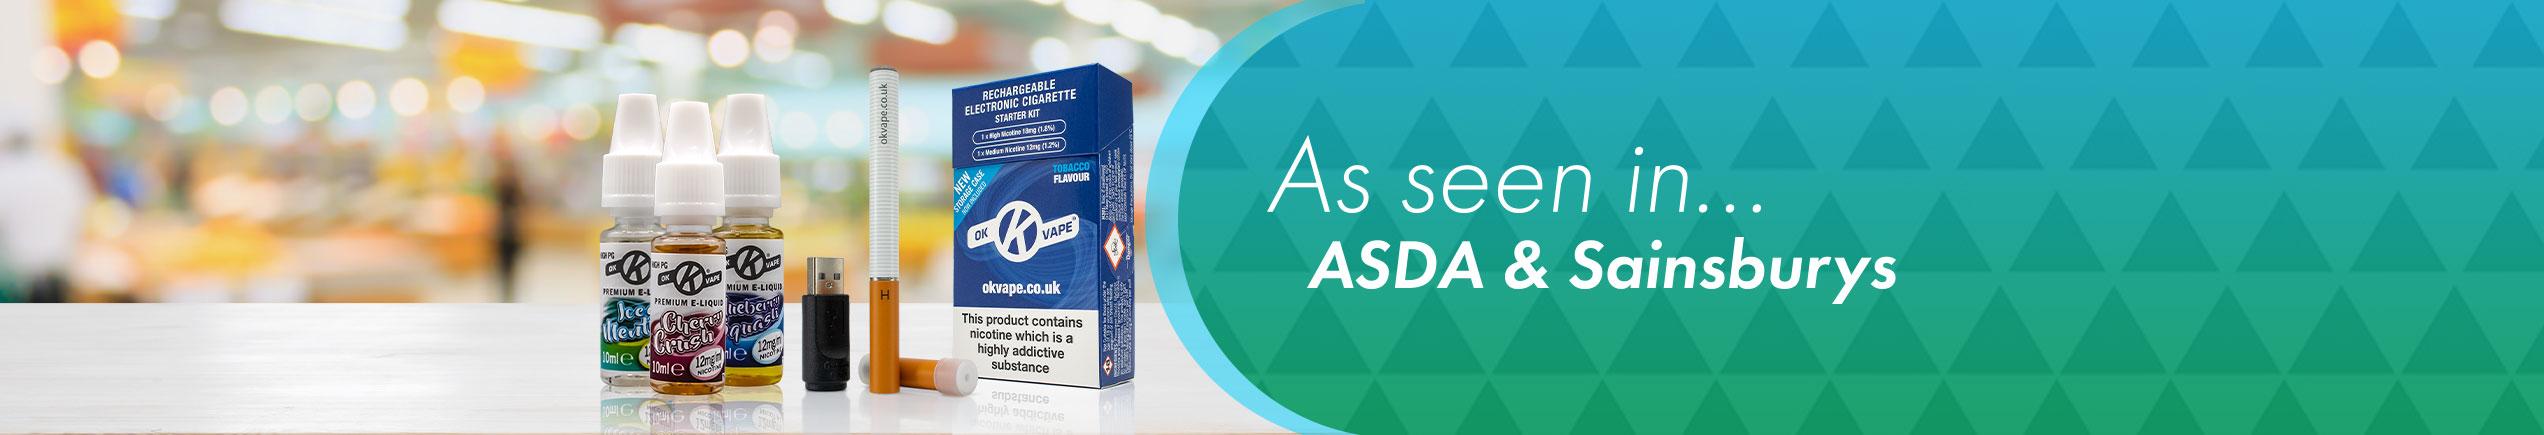 Homepage Slider Image - OK Vape As Seen In ASDA & Sainsburys